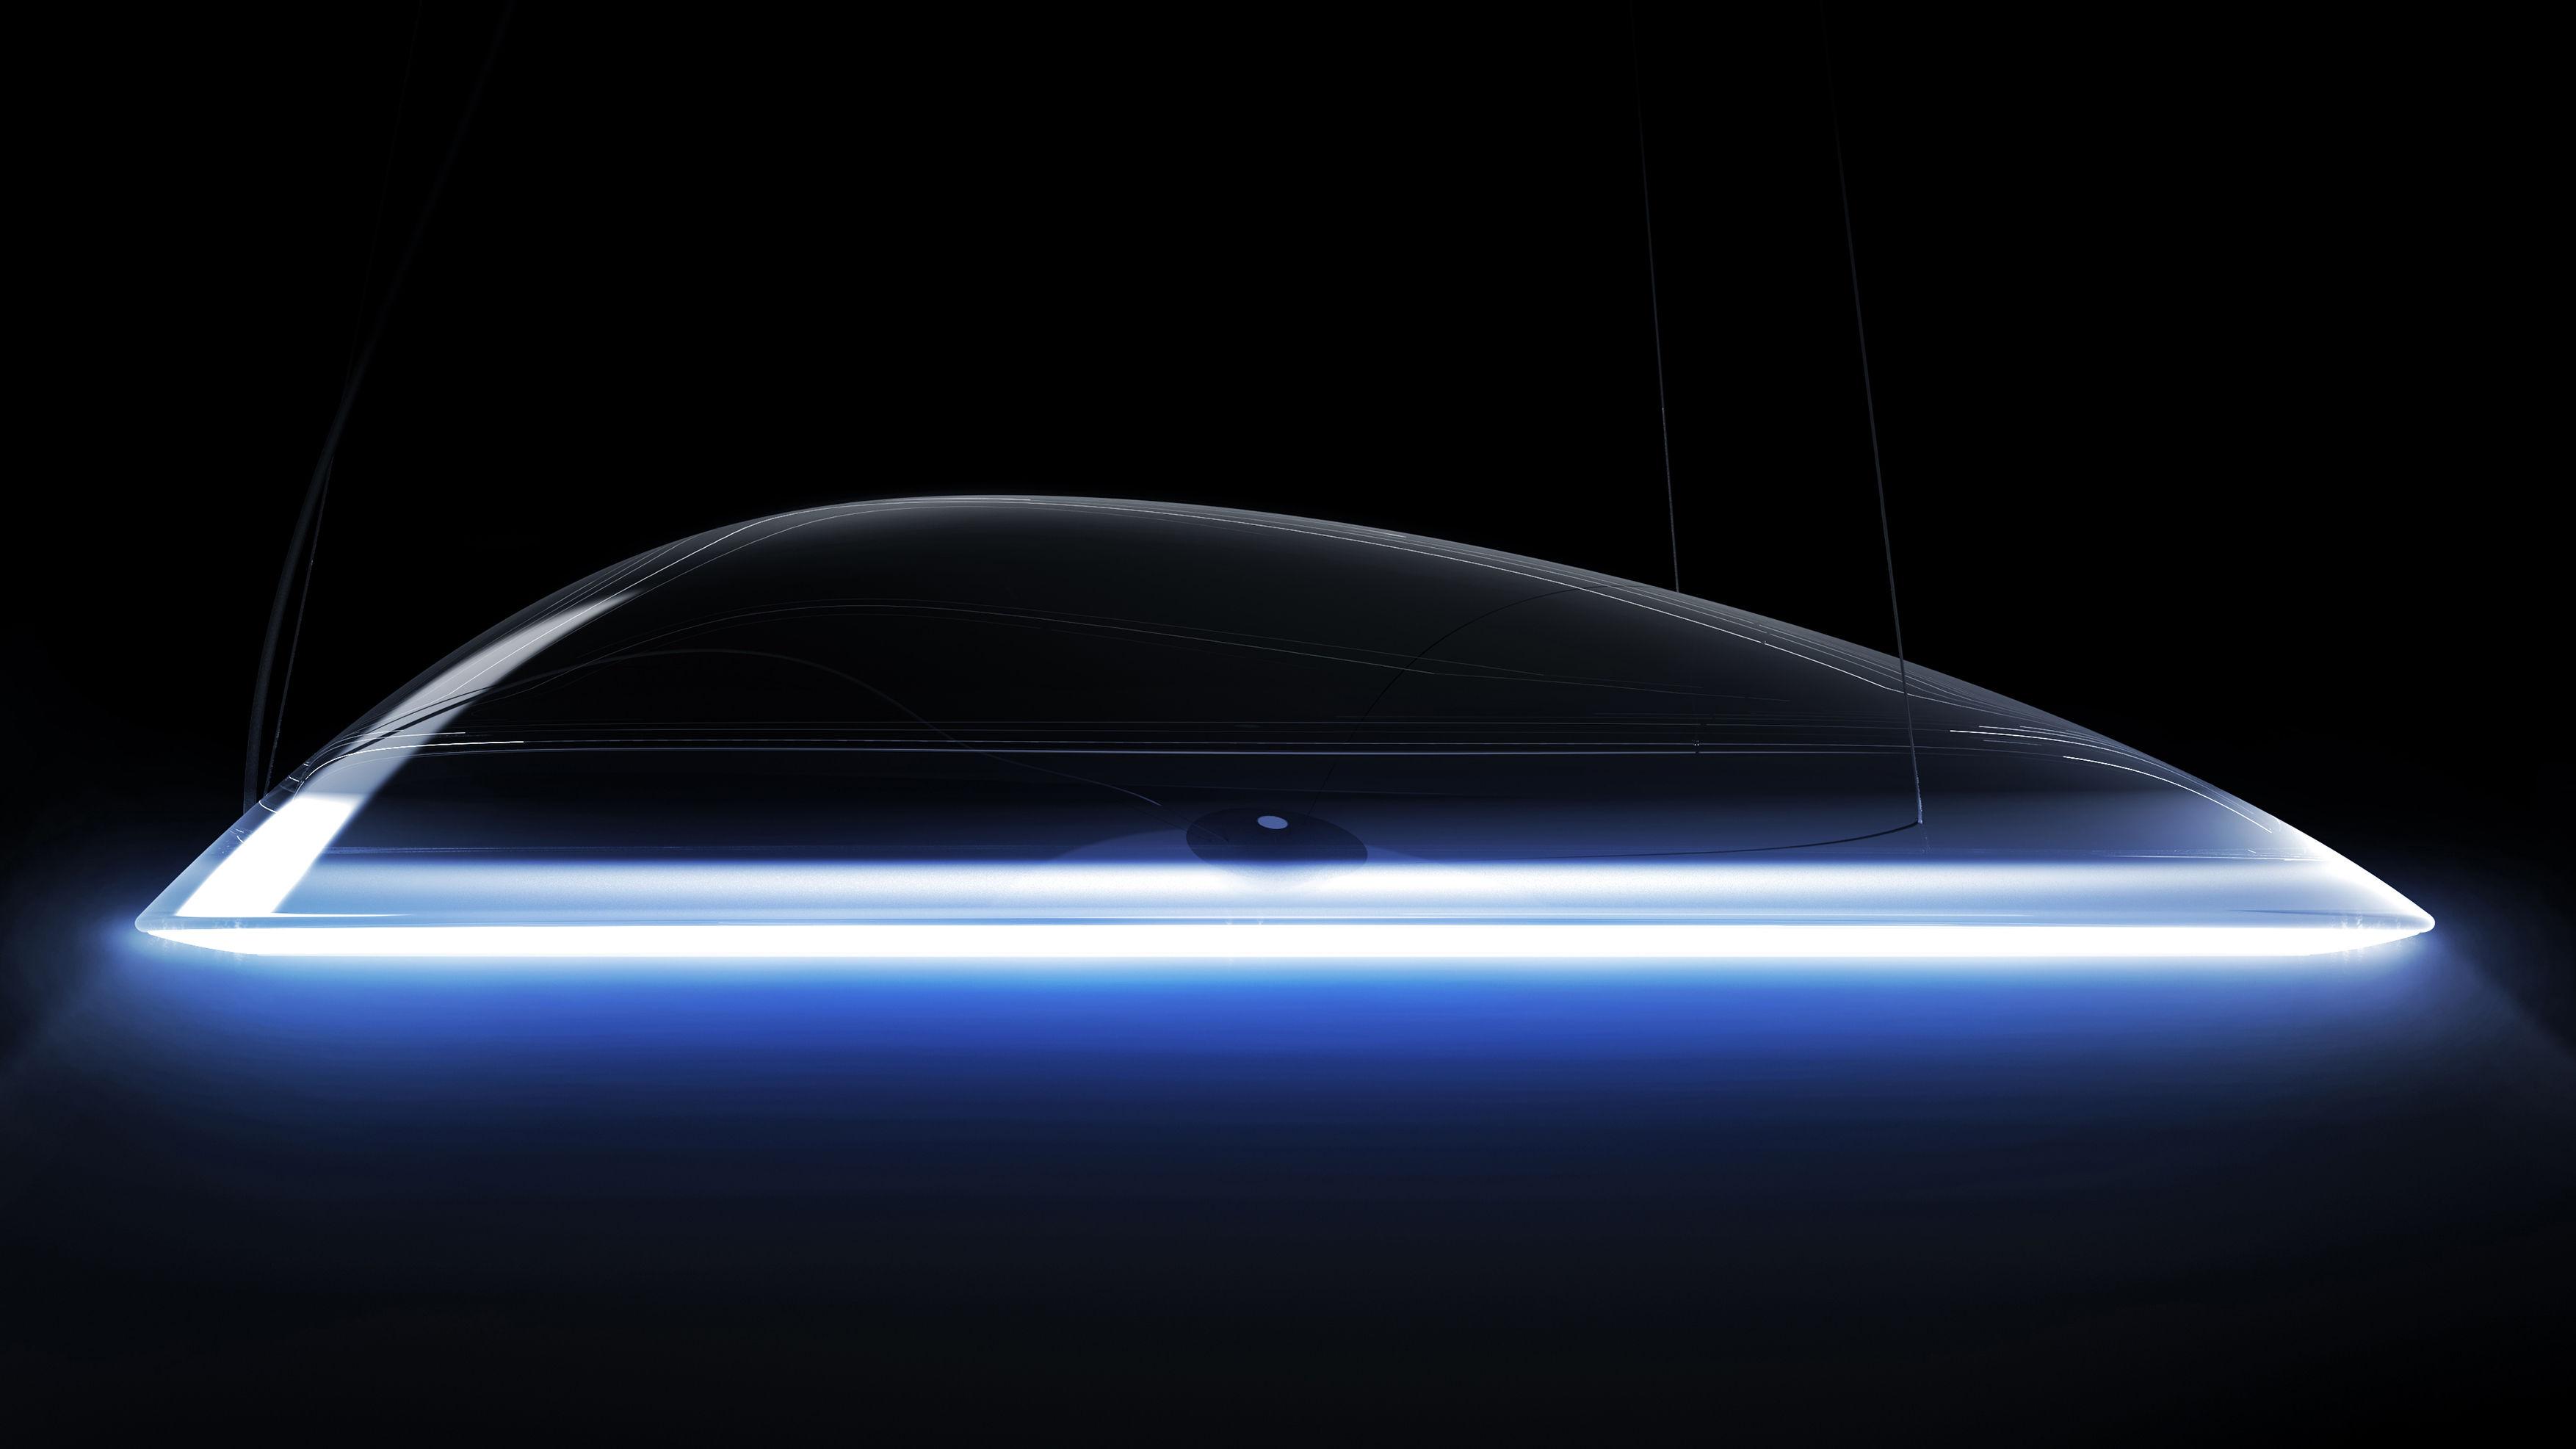 Leuchten - Pendelleuchten - Ameluna LED Bluetooth Pendelleuchte / by Mercedes-Benz - Ø 75 cm - Artemide - Transparent / Aluminiumstreifen - Aluminiumprofil, poliert, PMMA